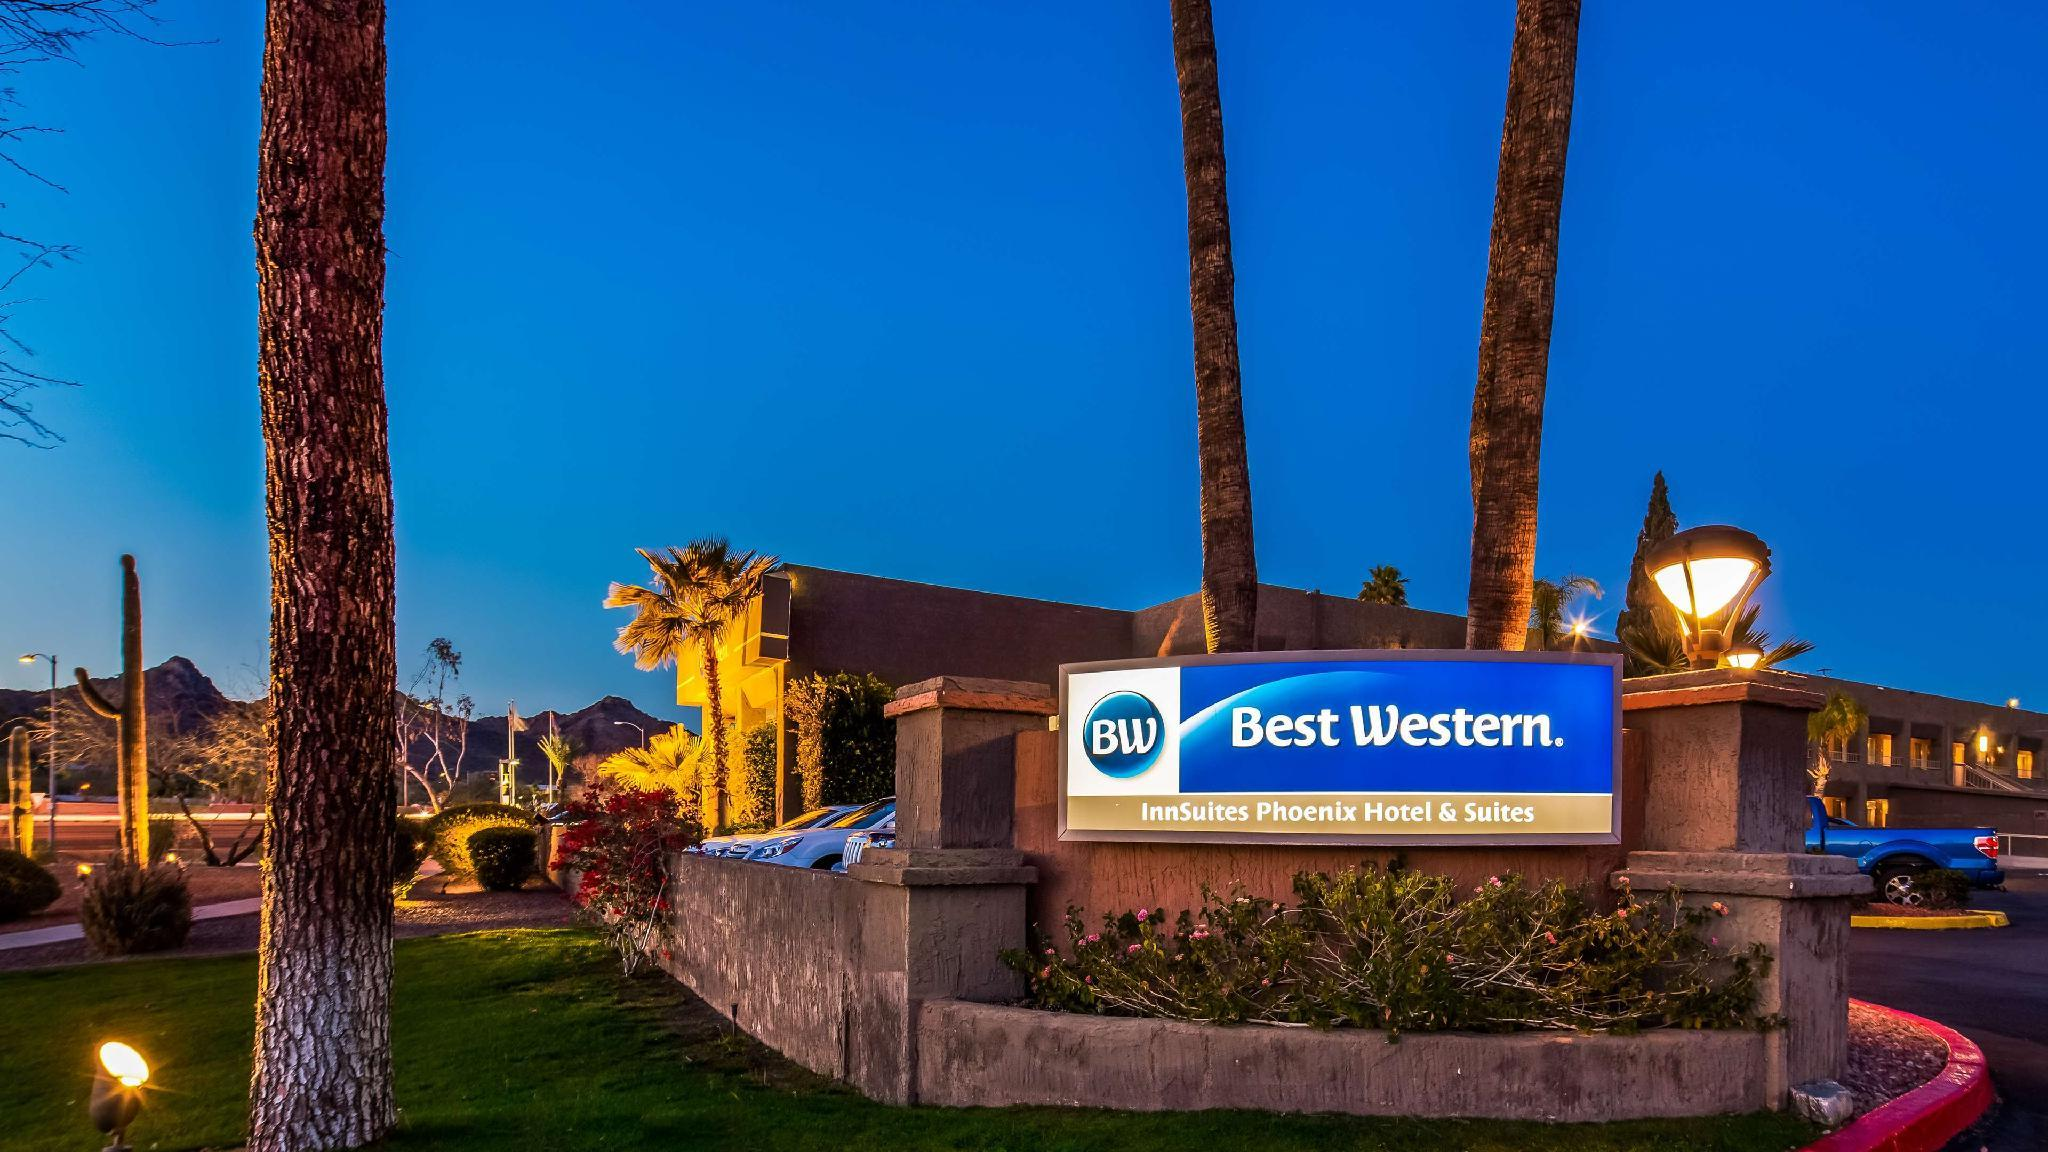 Best Western InnSuites Phoenix Hotel and Suites